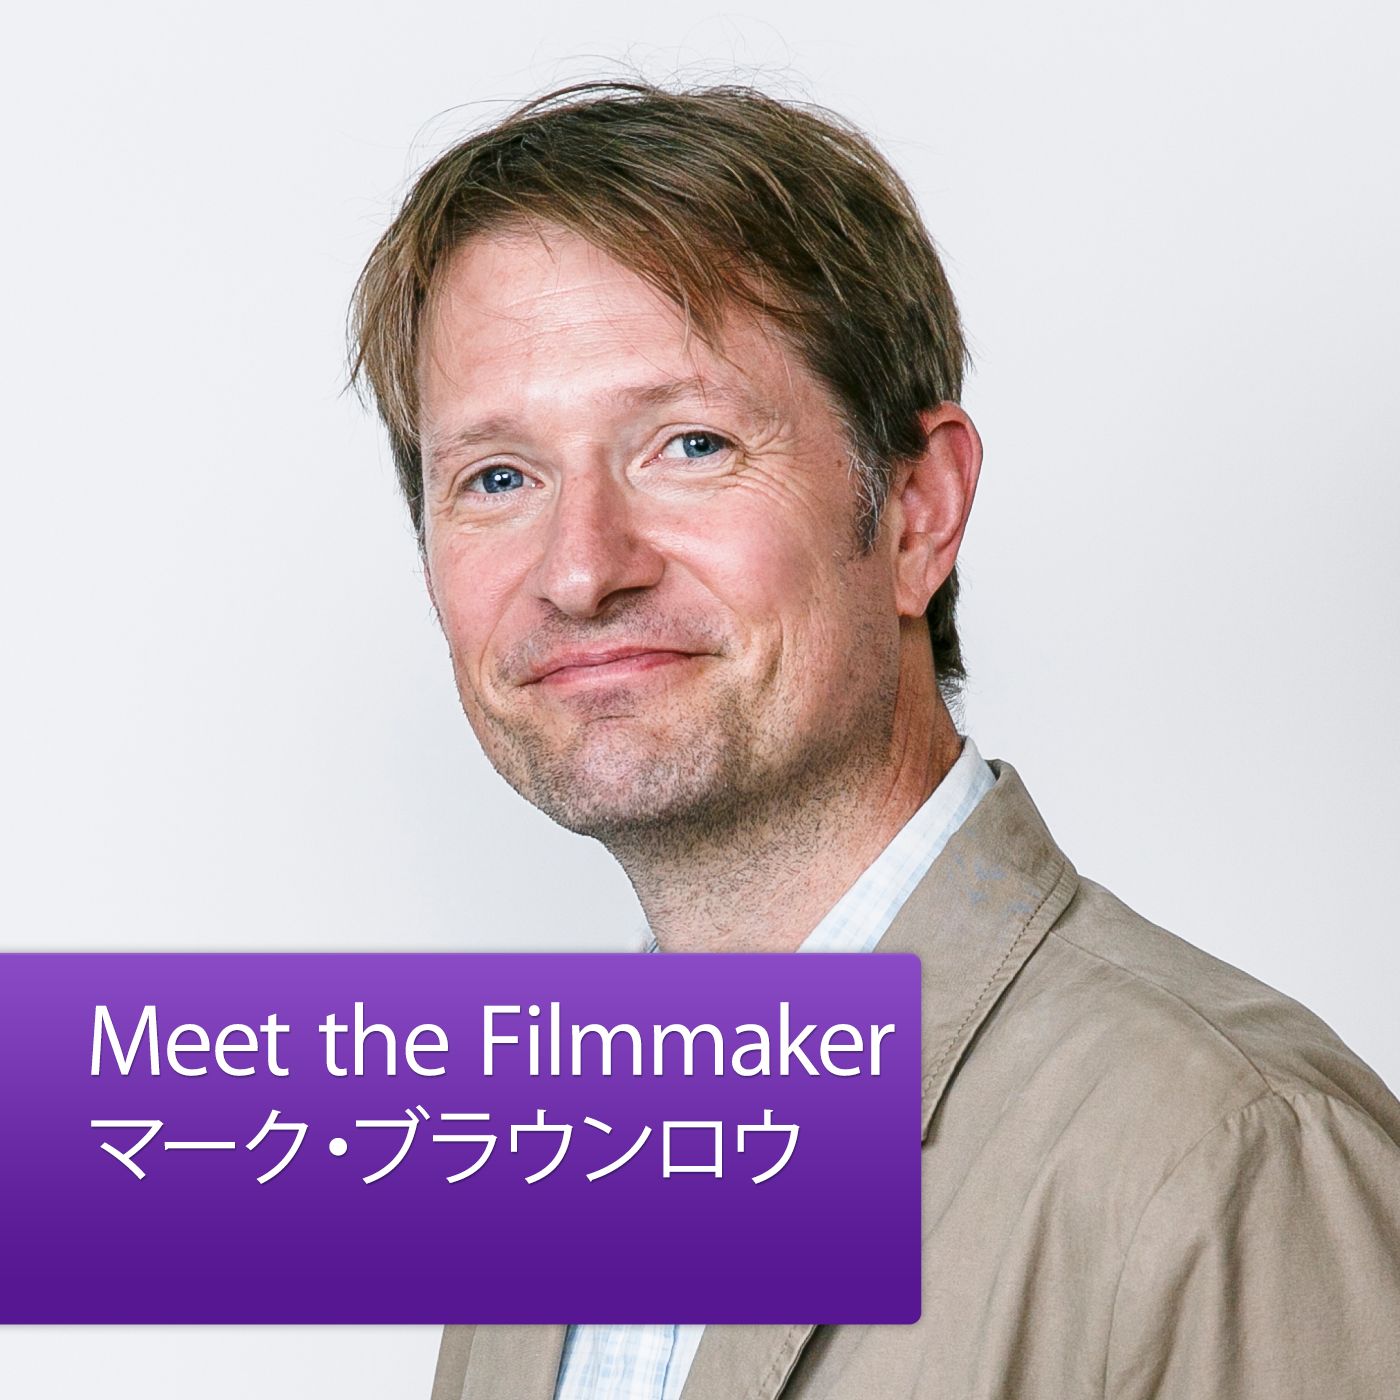 Meet the Filmmaker:マーク・ブラウンロウ